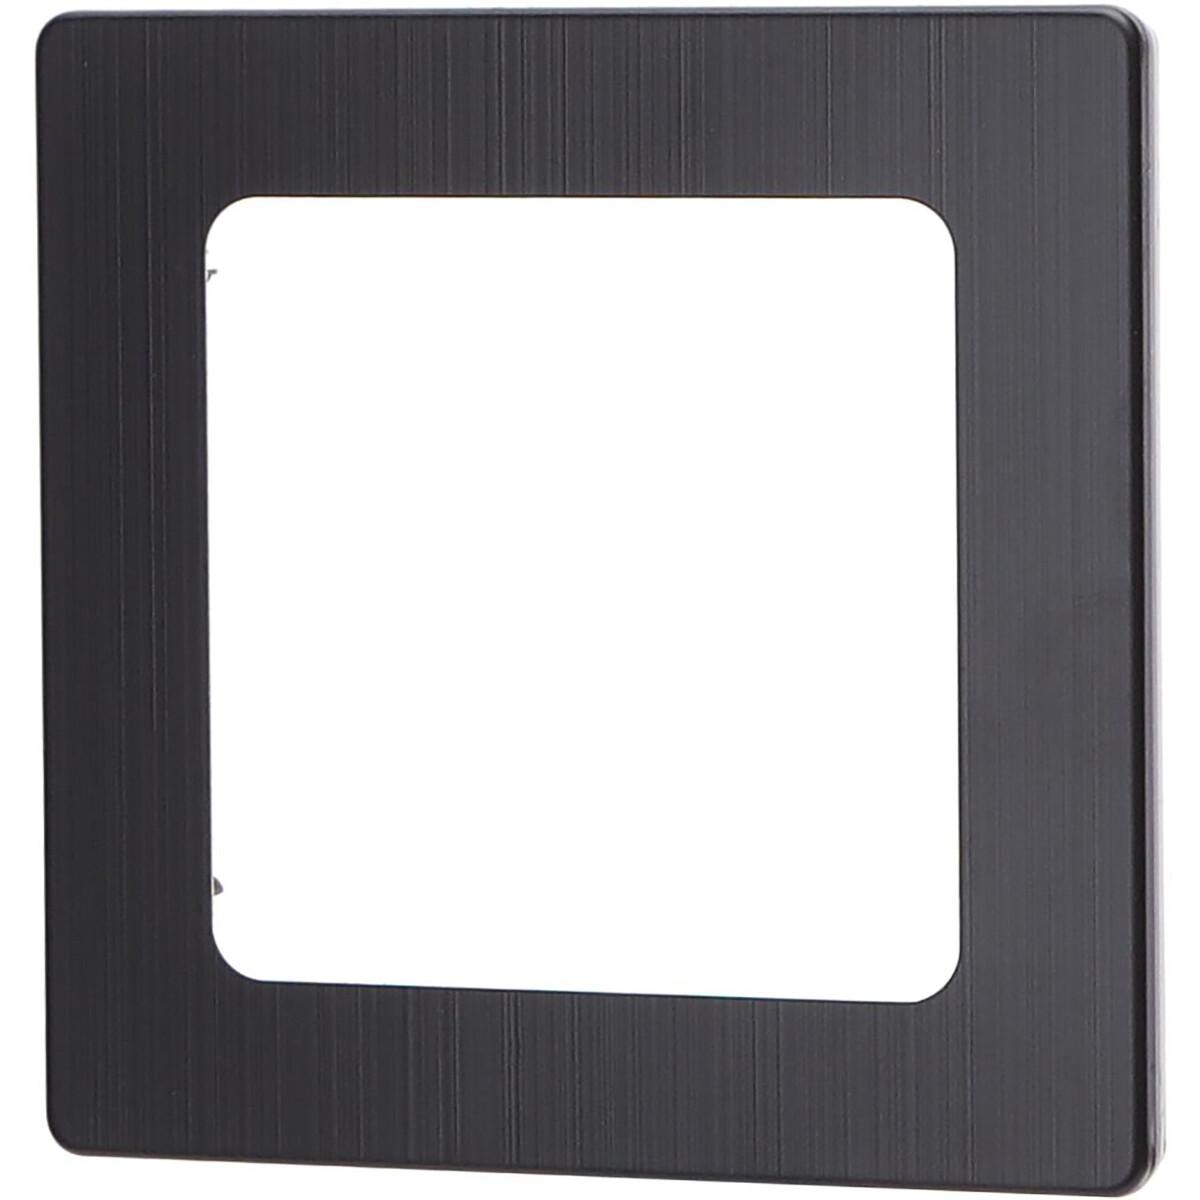 Afdekraam - Aigi Jura - 1-voudig - Vierkant - Aluminium - Zwart